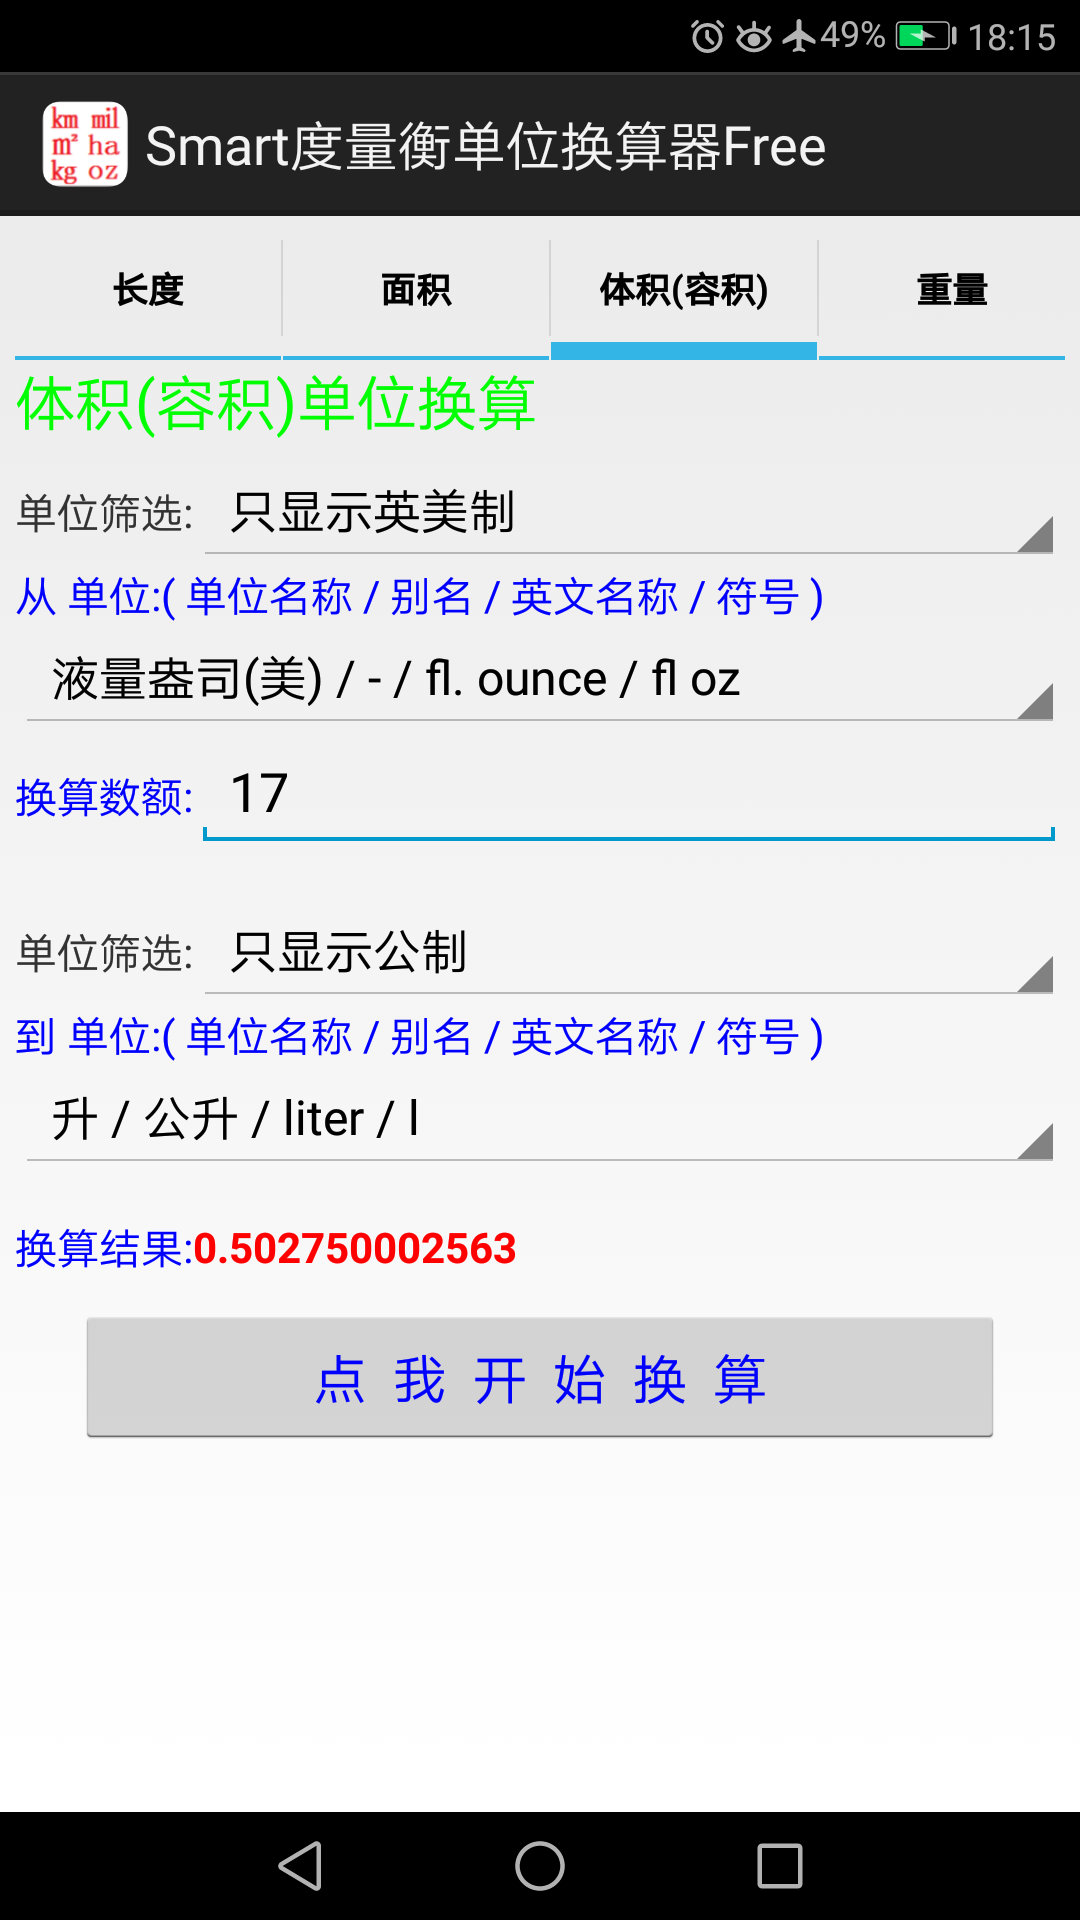 度量衡_free_fl oz.png